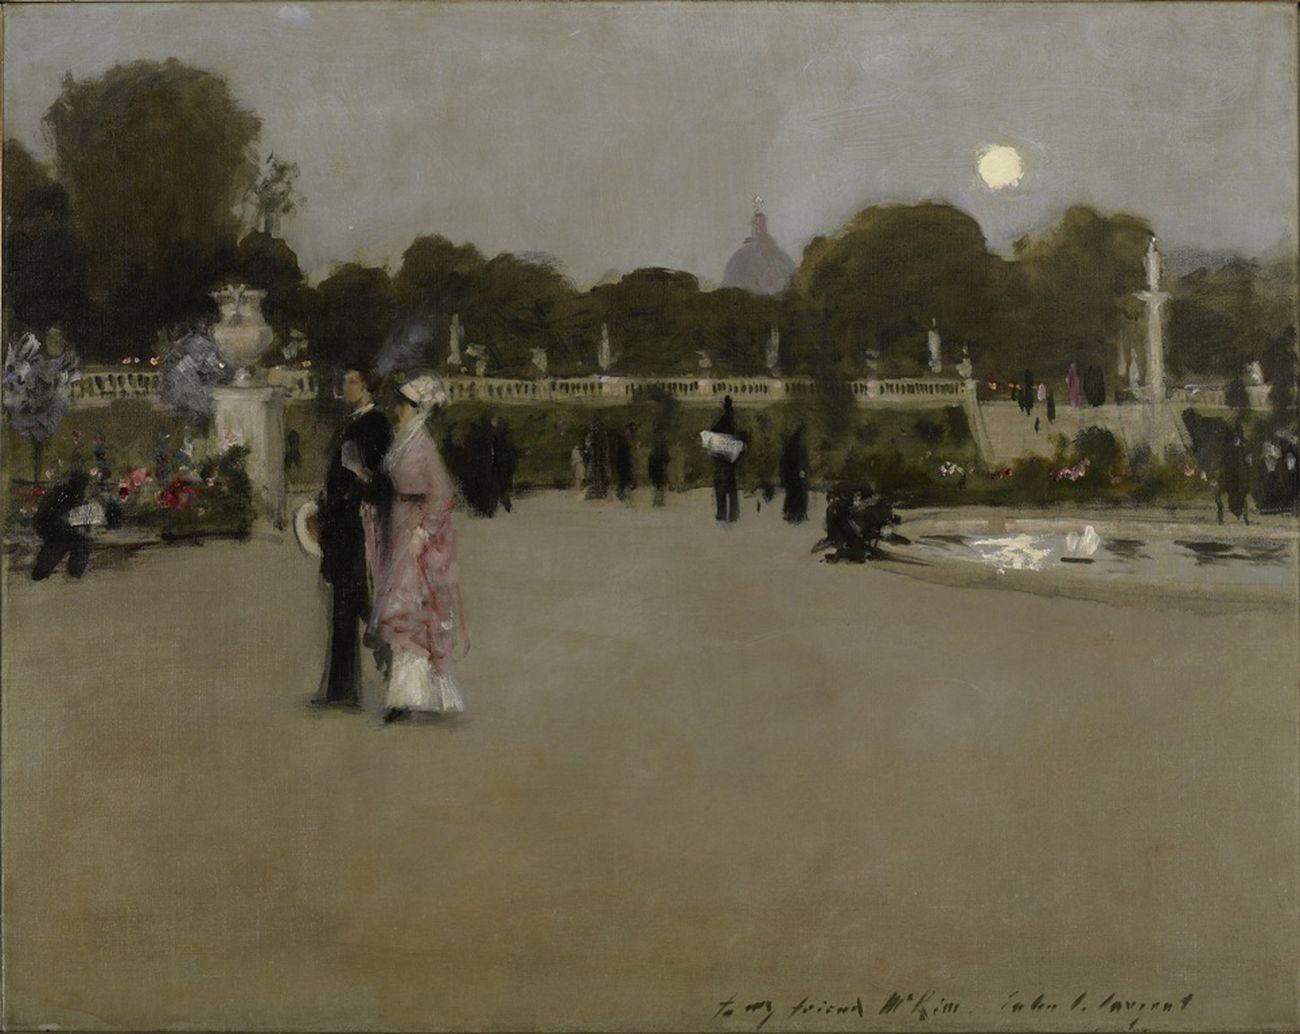 John Singer Sargent, Luxembourg Gardens at Twilight, 1879. Minneapolis Institute of Arts